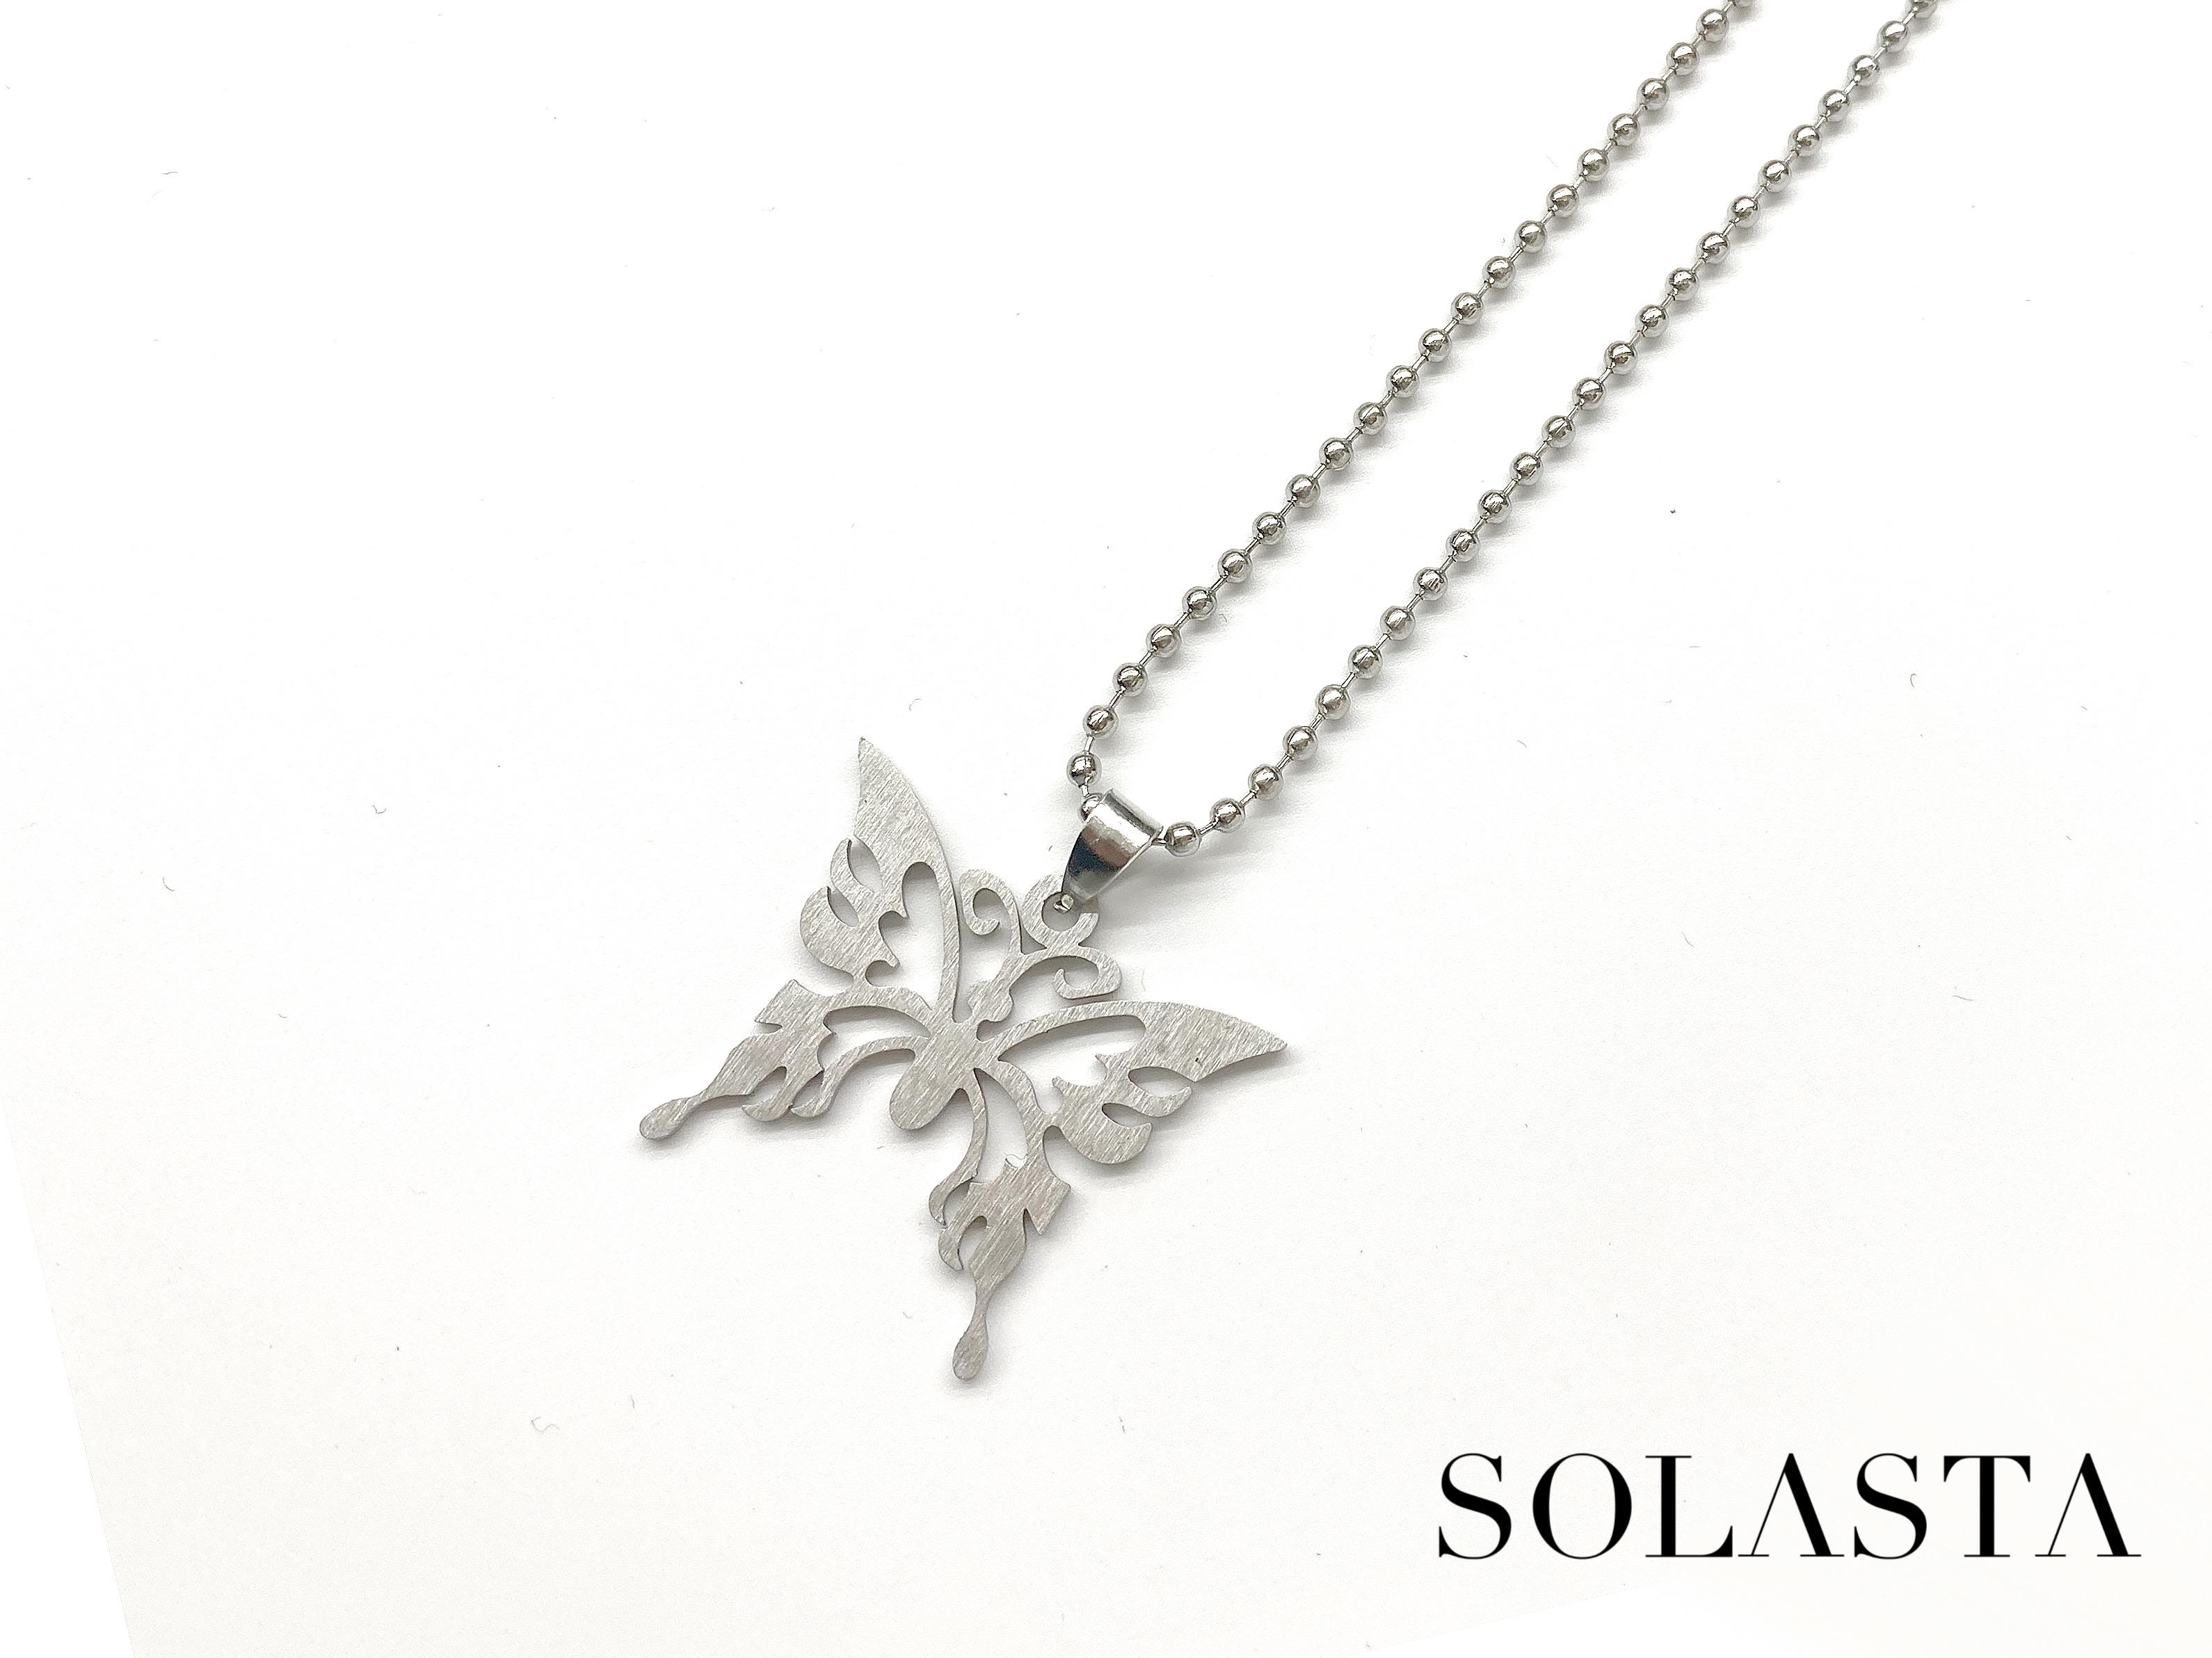 SOLASTA - BUTTERFLY